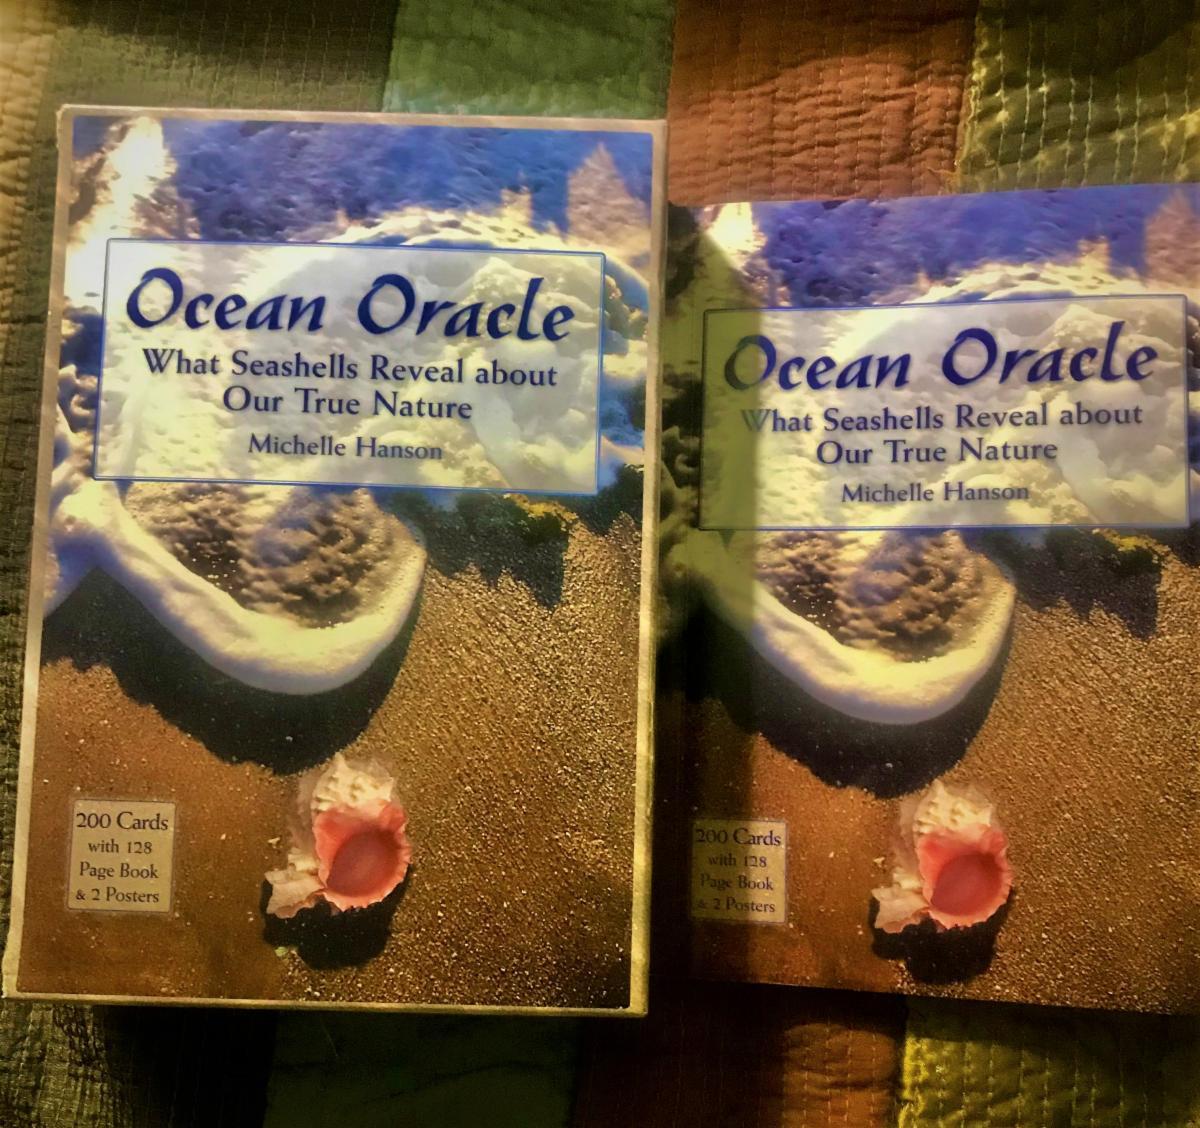 OceanOracleNewBookBox